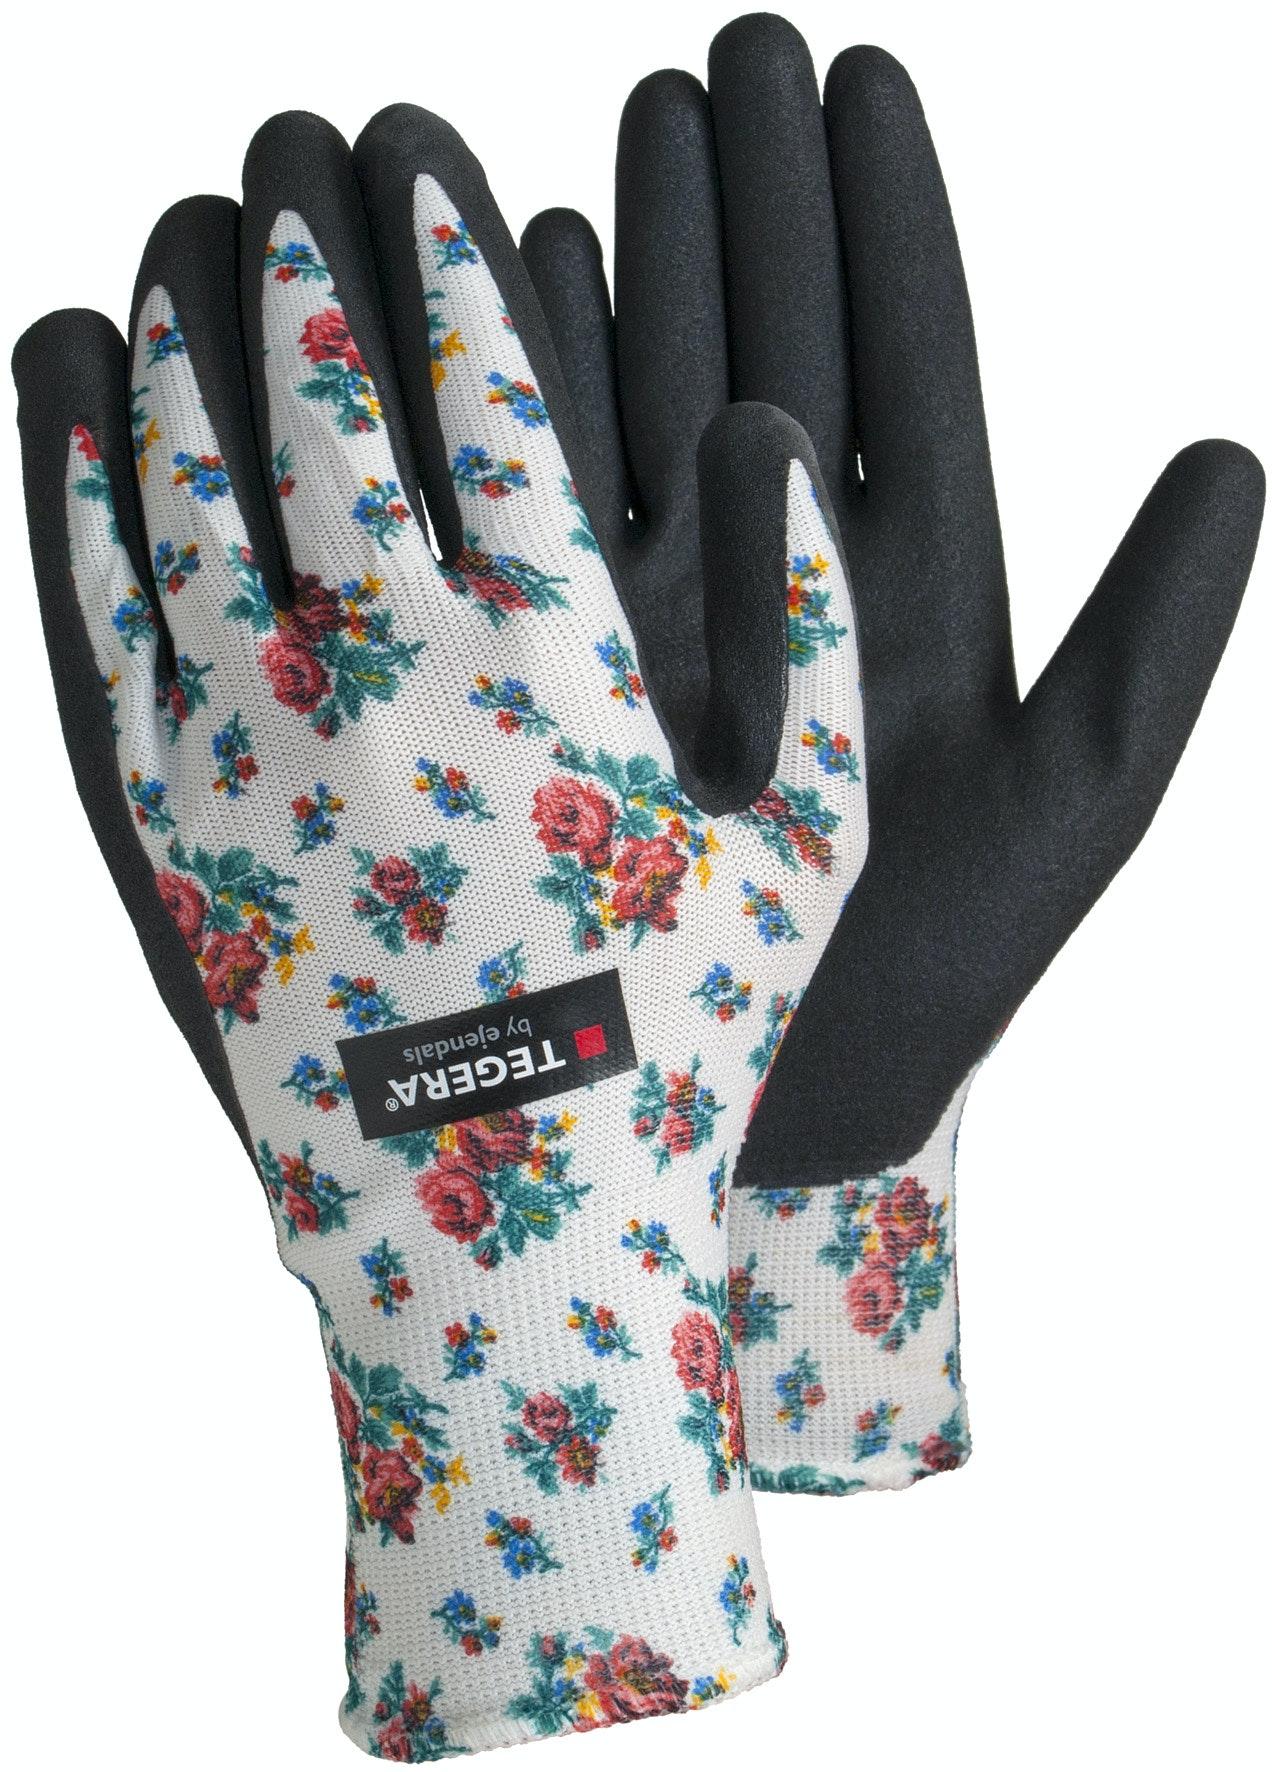 Handske Tegera 90065 Nitrilfoam Stl 6